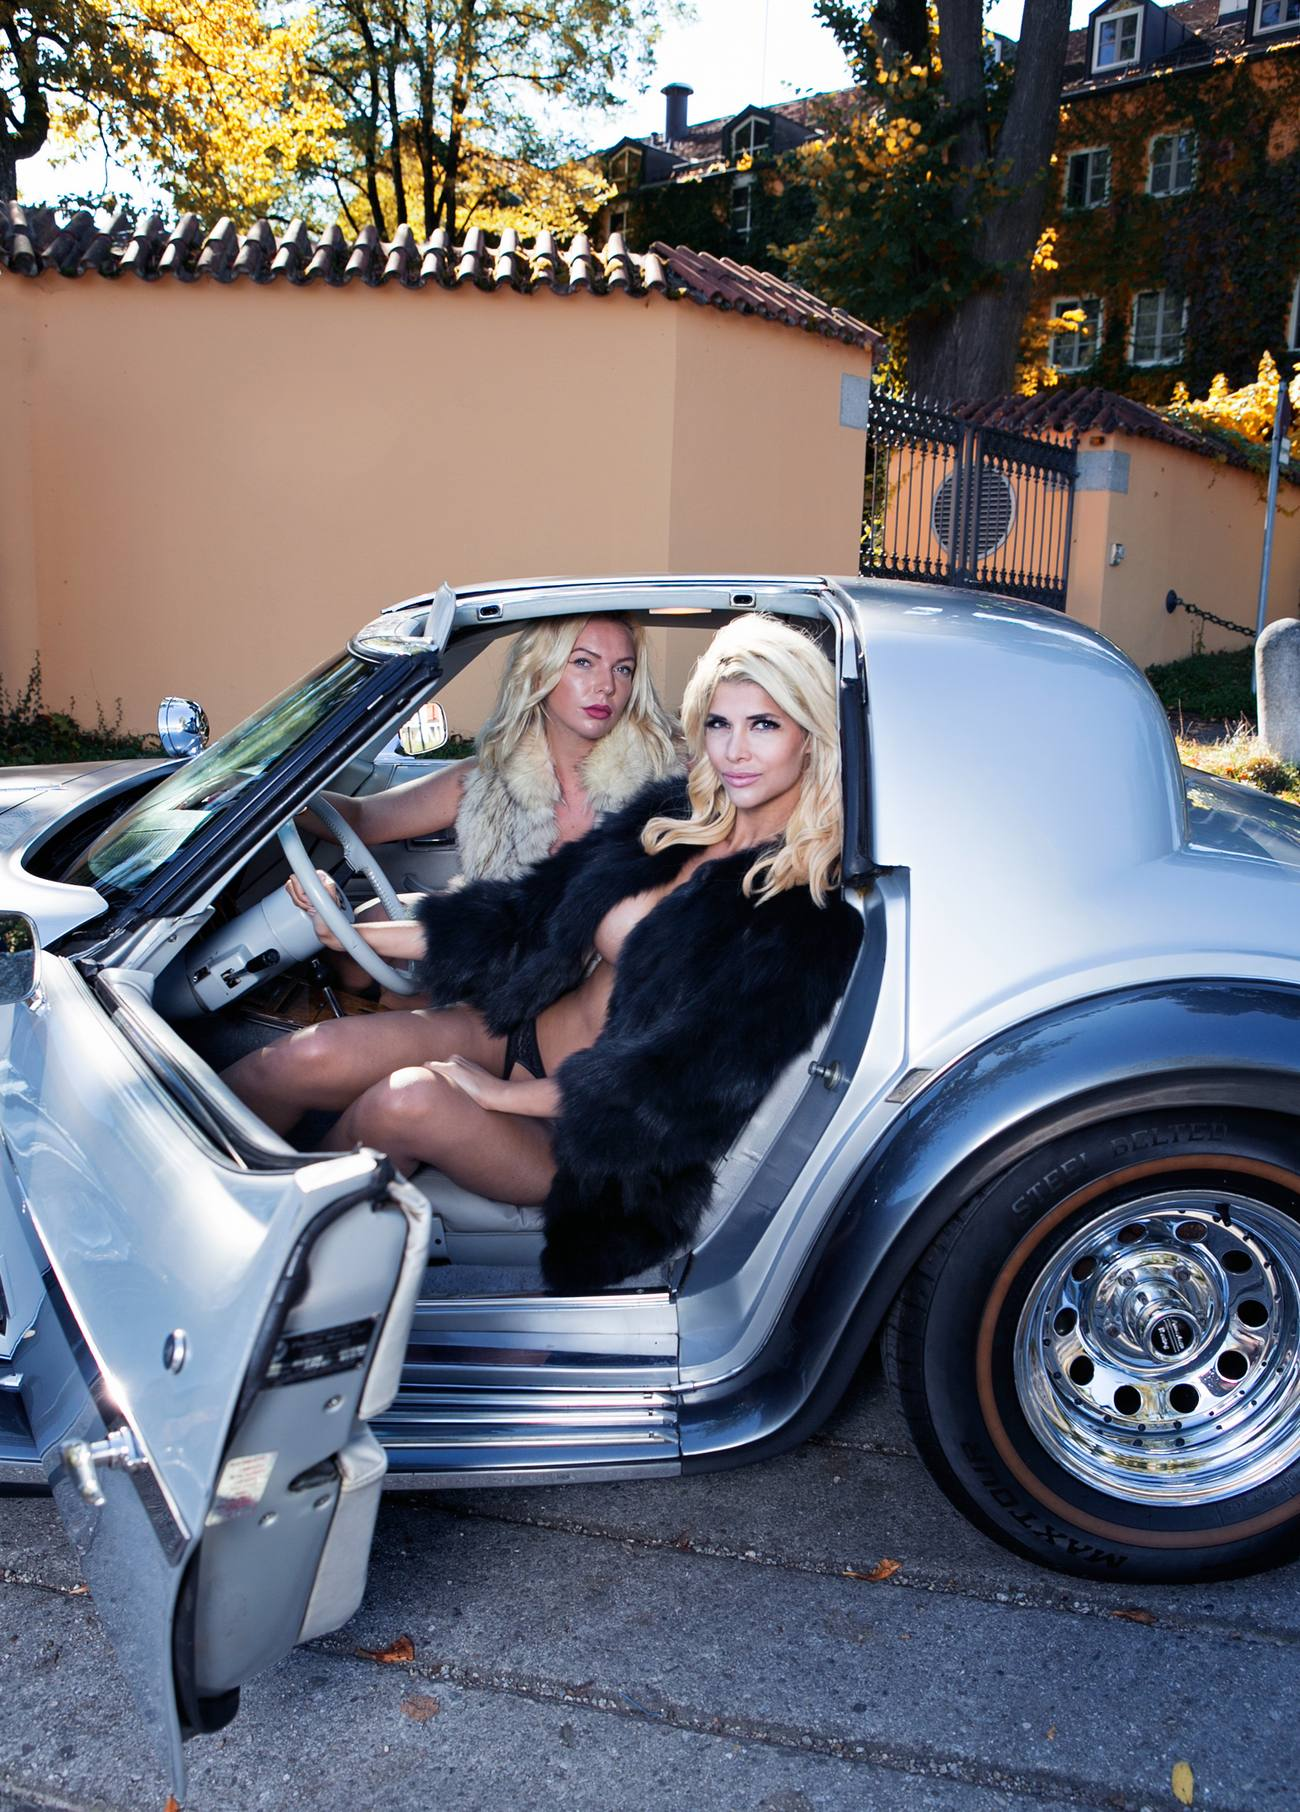 Micaela Schaefer GQ Magazine – Celeb Donut Scarlett Johansson